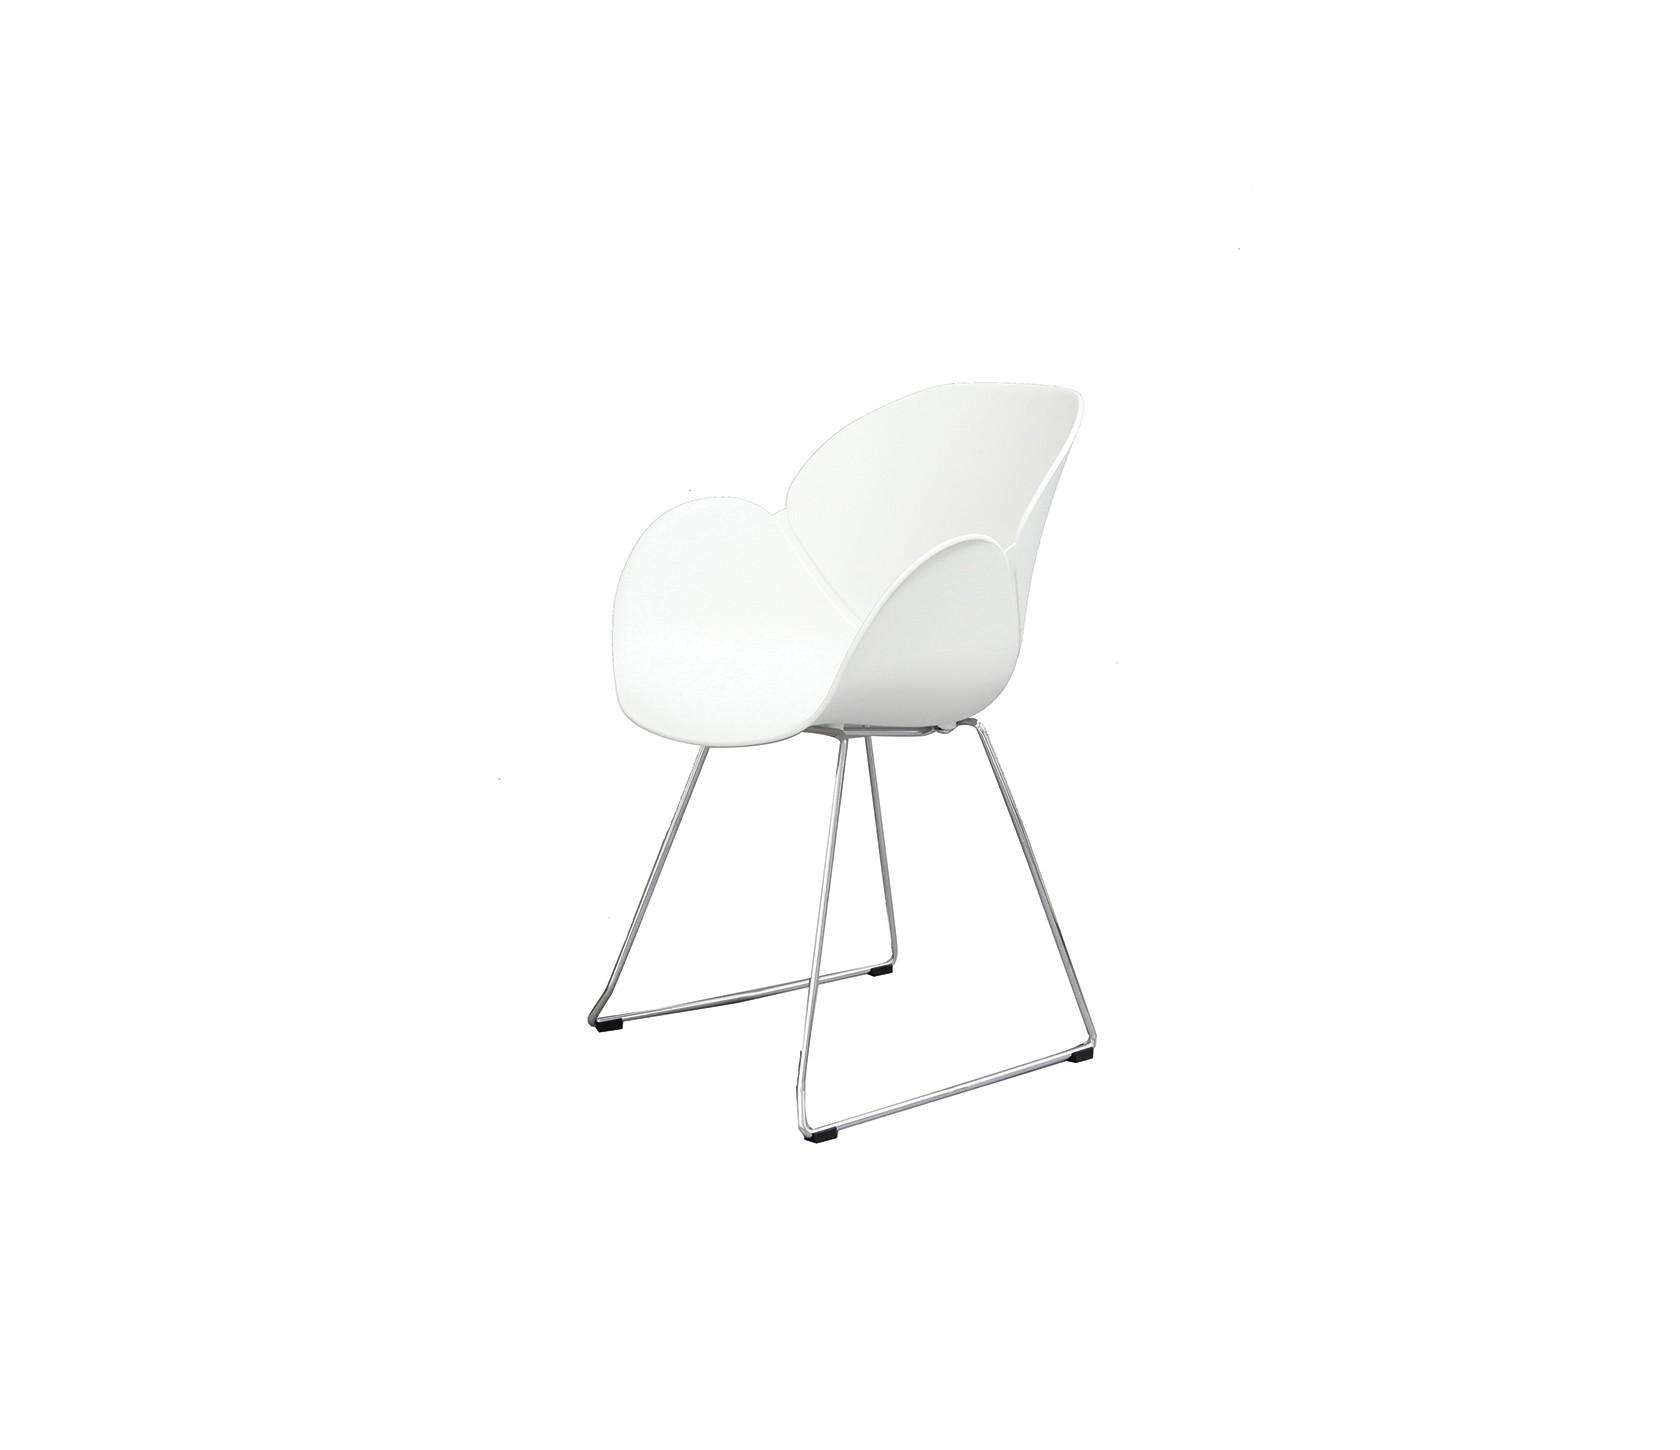 Стул FL-05 белыйОбеденные стулья<br>&amp;lt;div&amp;gt;&amp;lt;br&amp;gt;&amp;lt;/div&amp;gt;<br><br>Material: Пластик<br>Width см: 58<br>Depth см: 59<br>Height см: 87